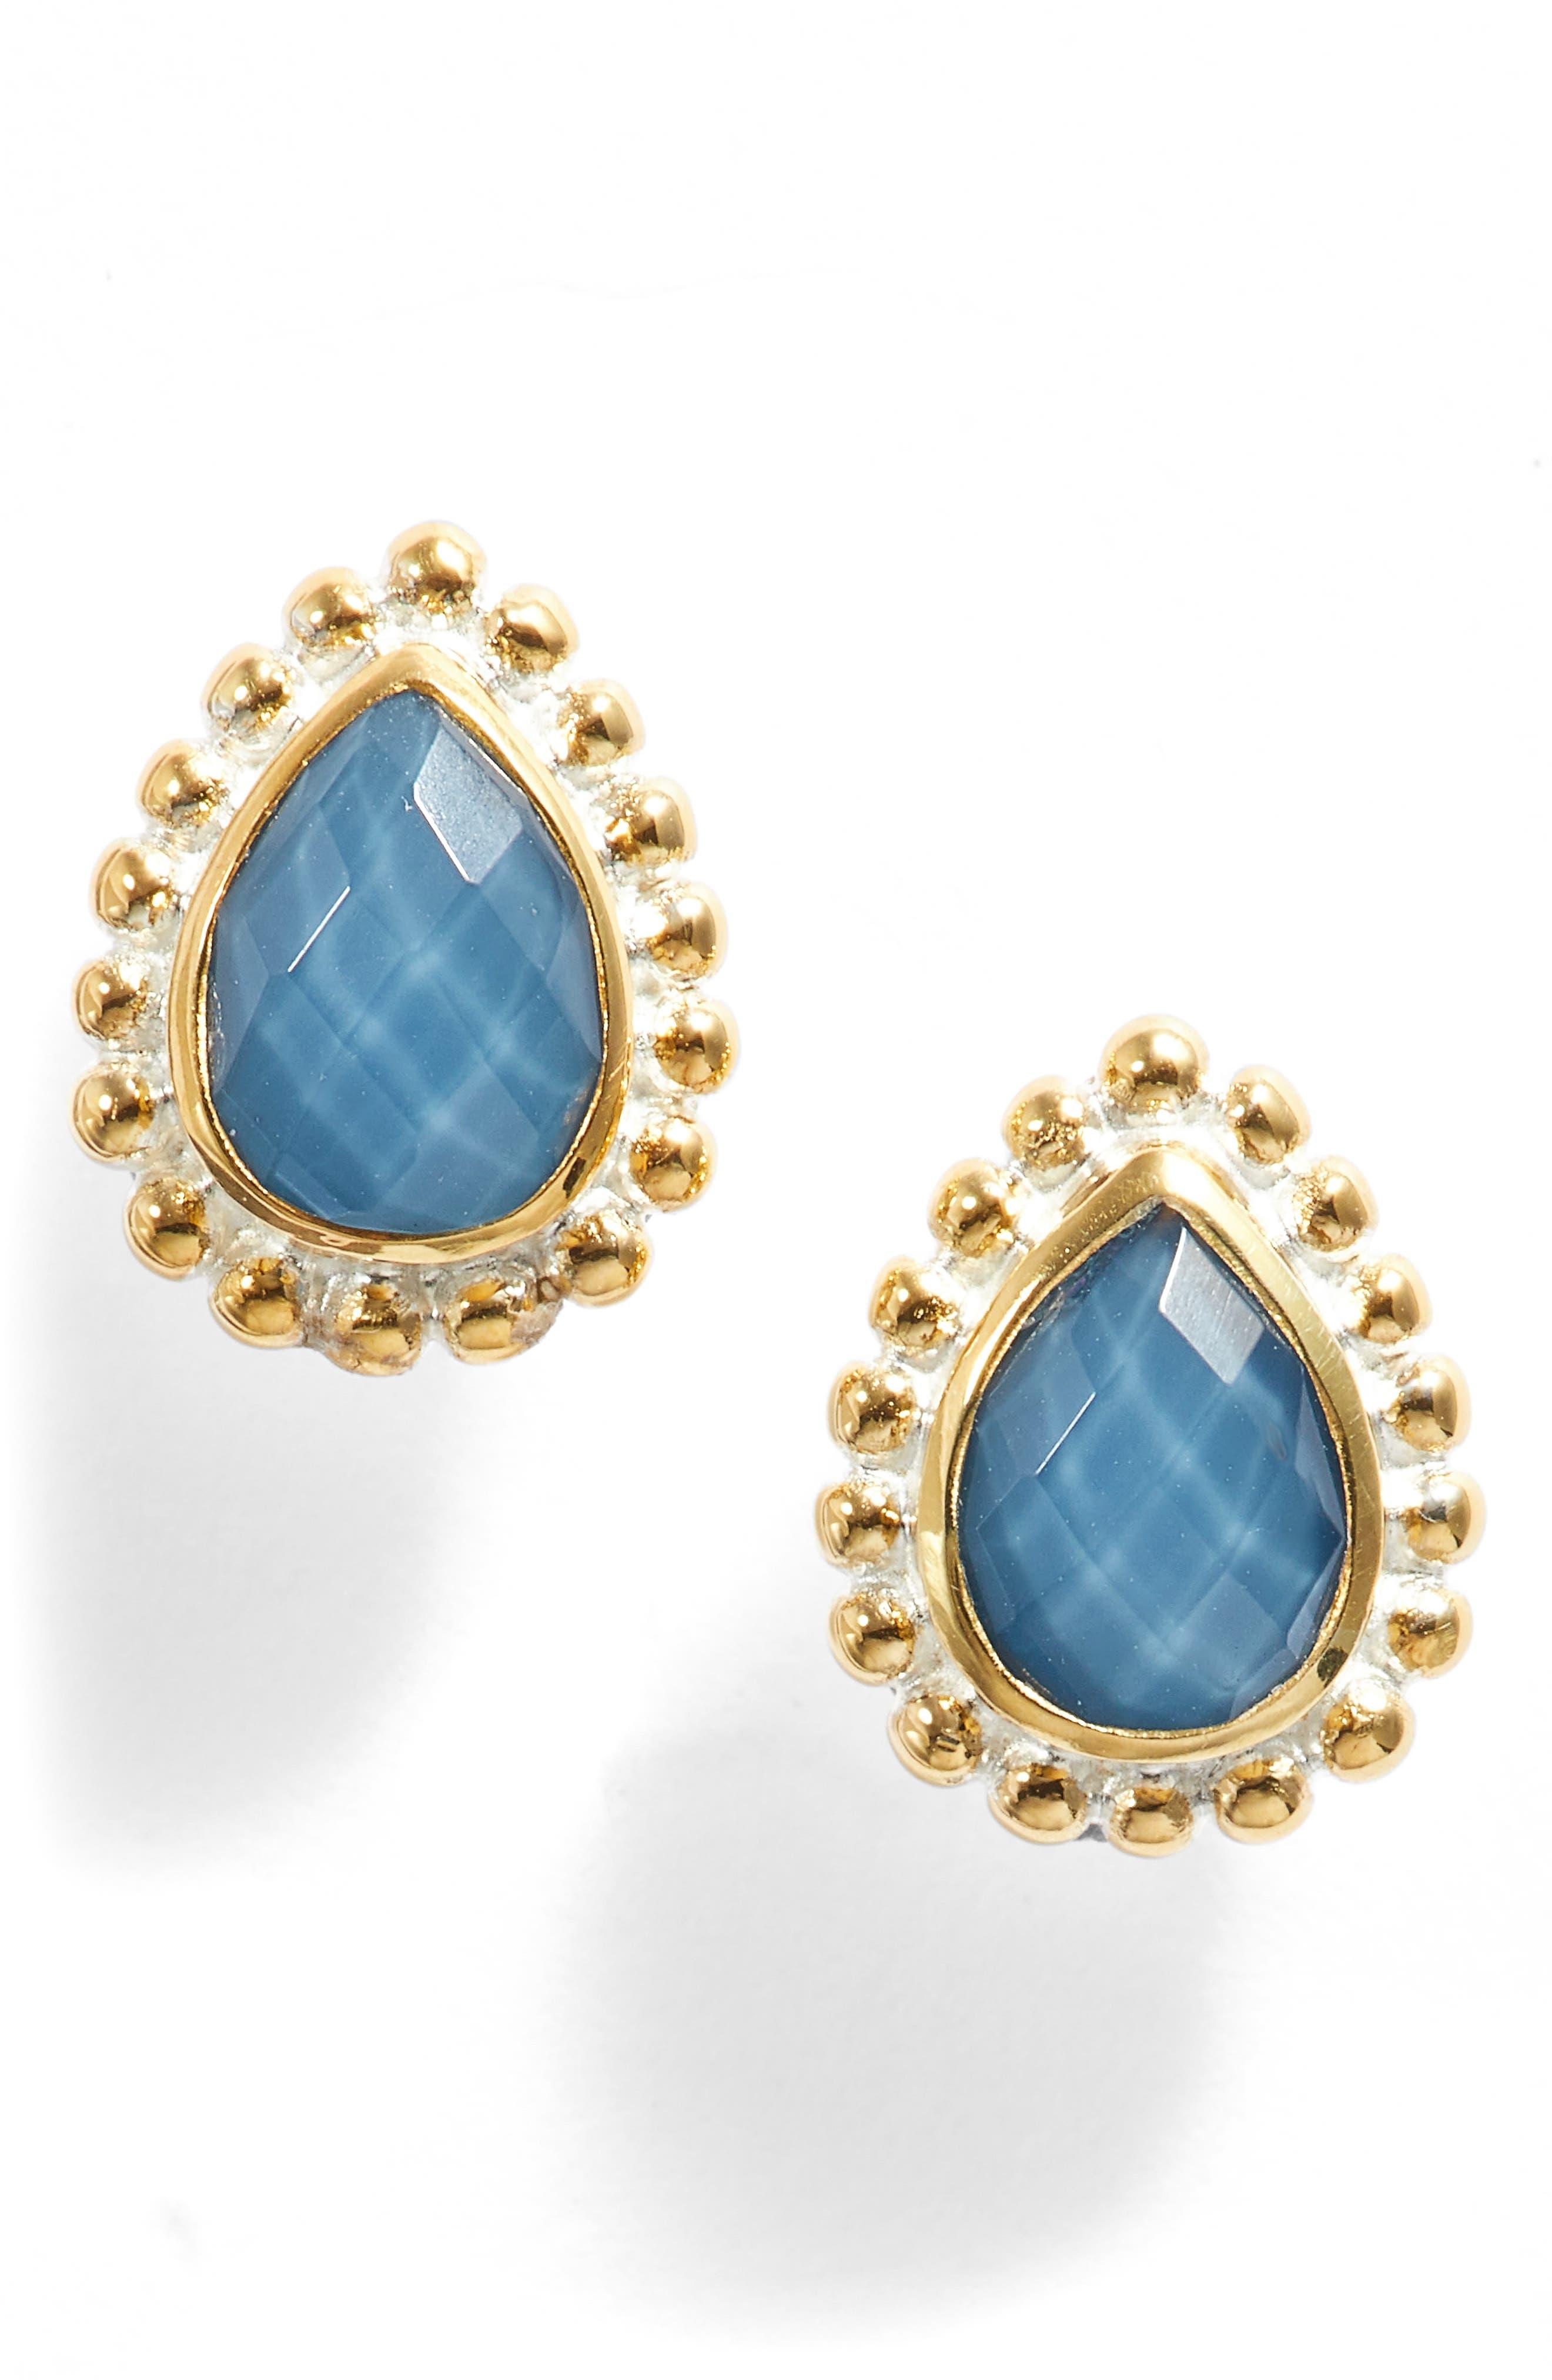 ANNA BECK Blue Quartz Teardrop Stud Earrings